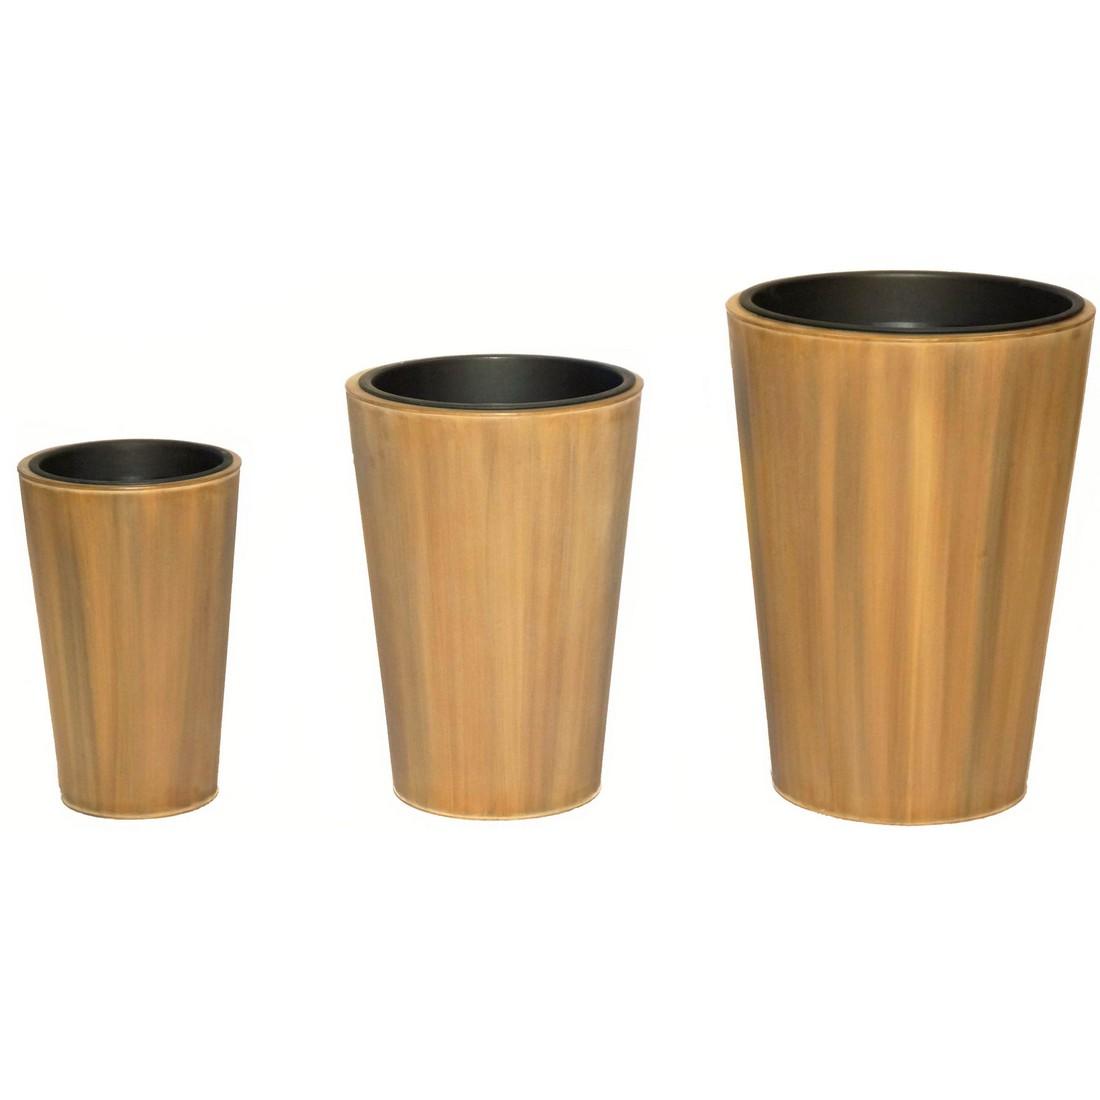 Pflanzkübel Wood – Zink – Sky – 3er-Set, Helmes Home & Garden kaufen